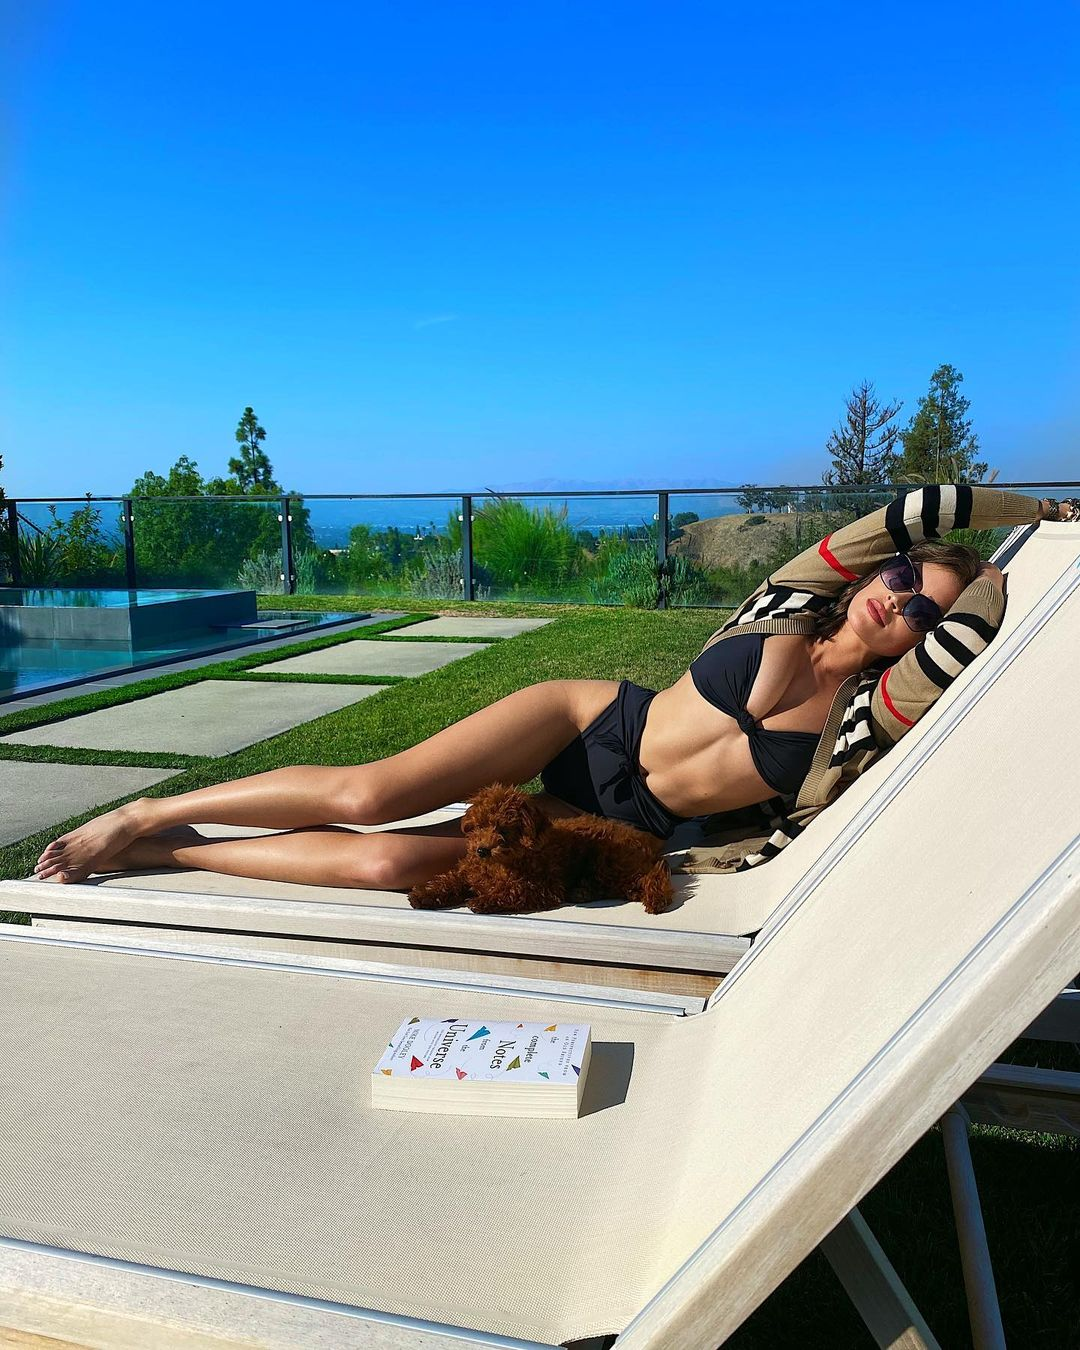 Olivia Culpo donning Skimpy black high rise bikini bottom